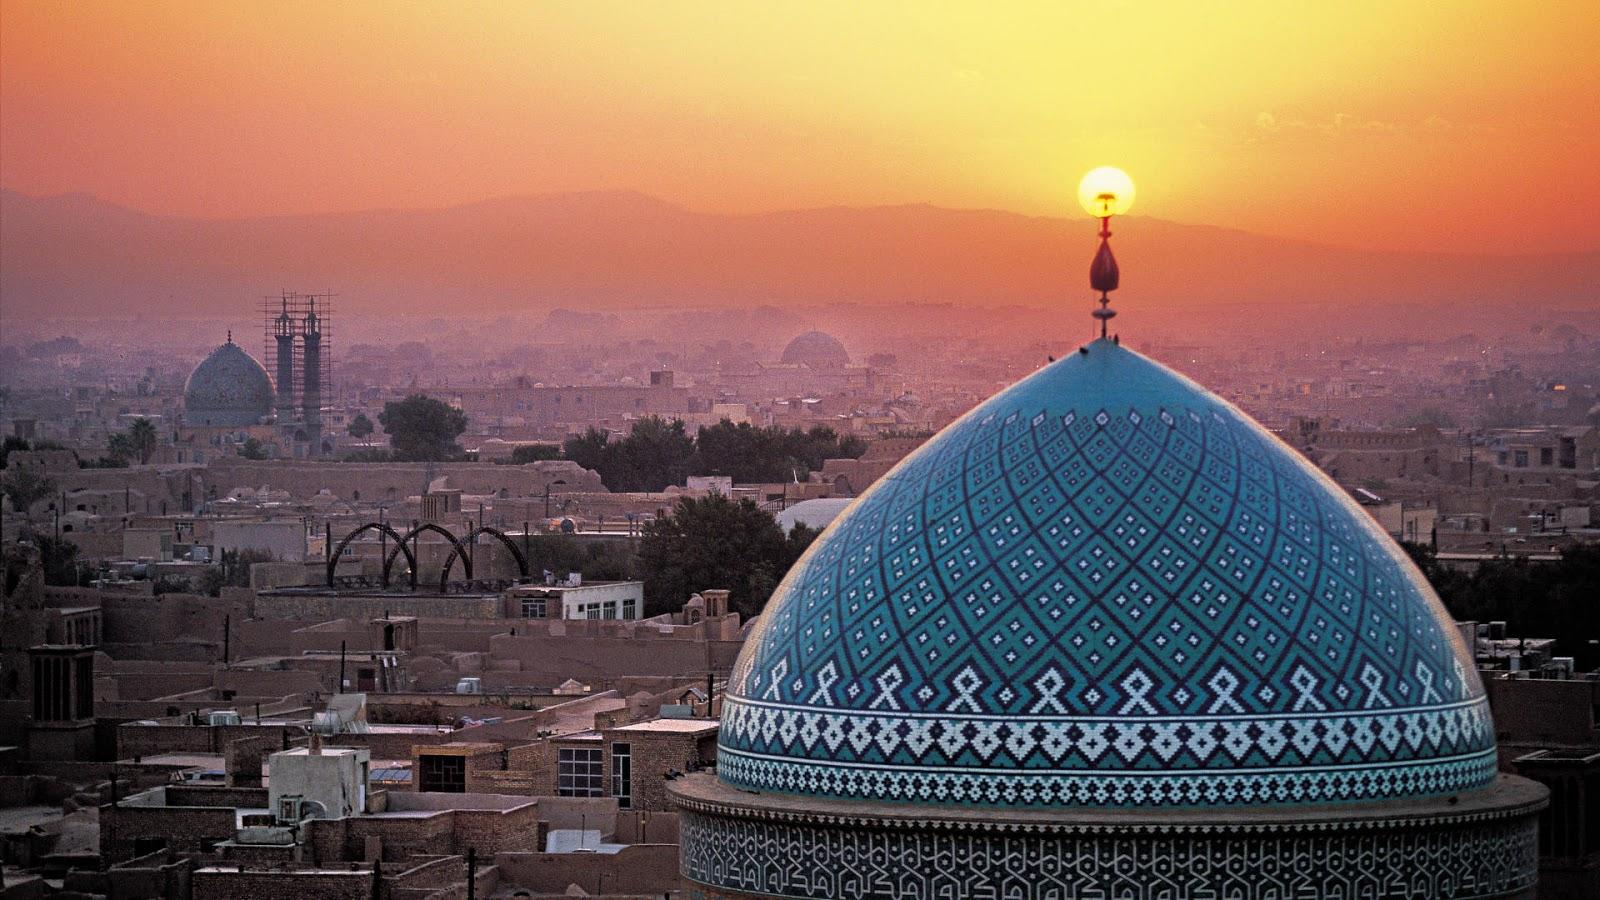 Hd Wallpapers Desktop Iran Country Hd Desktop Wallpapers